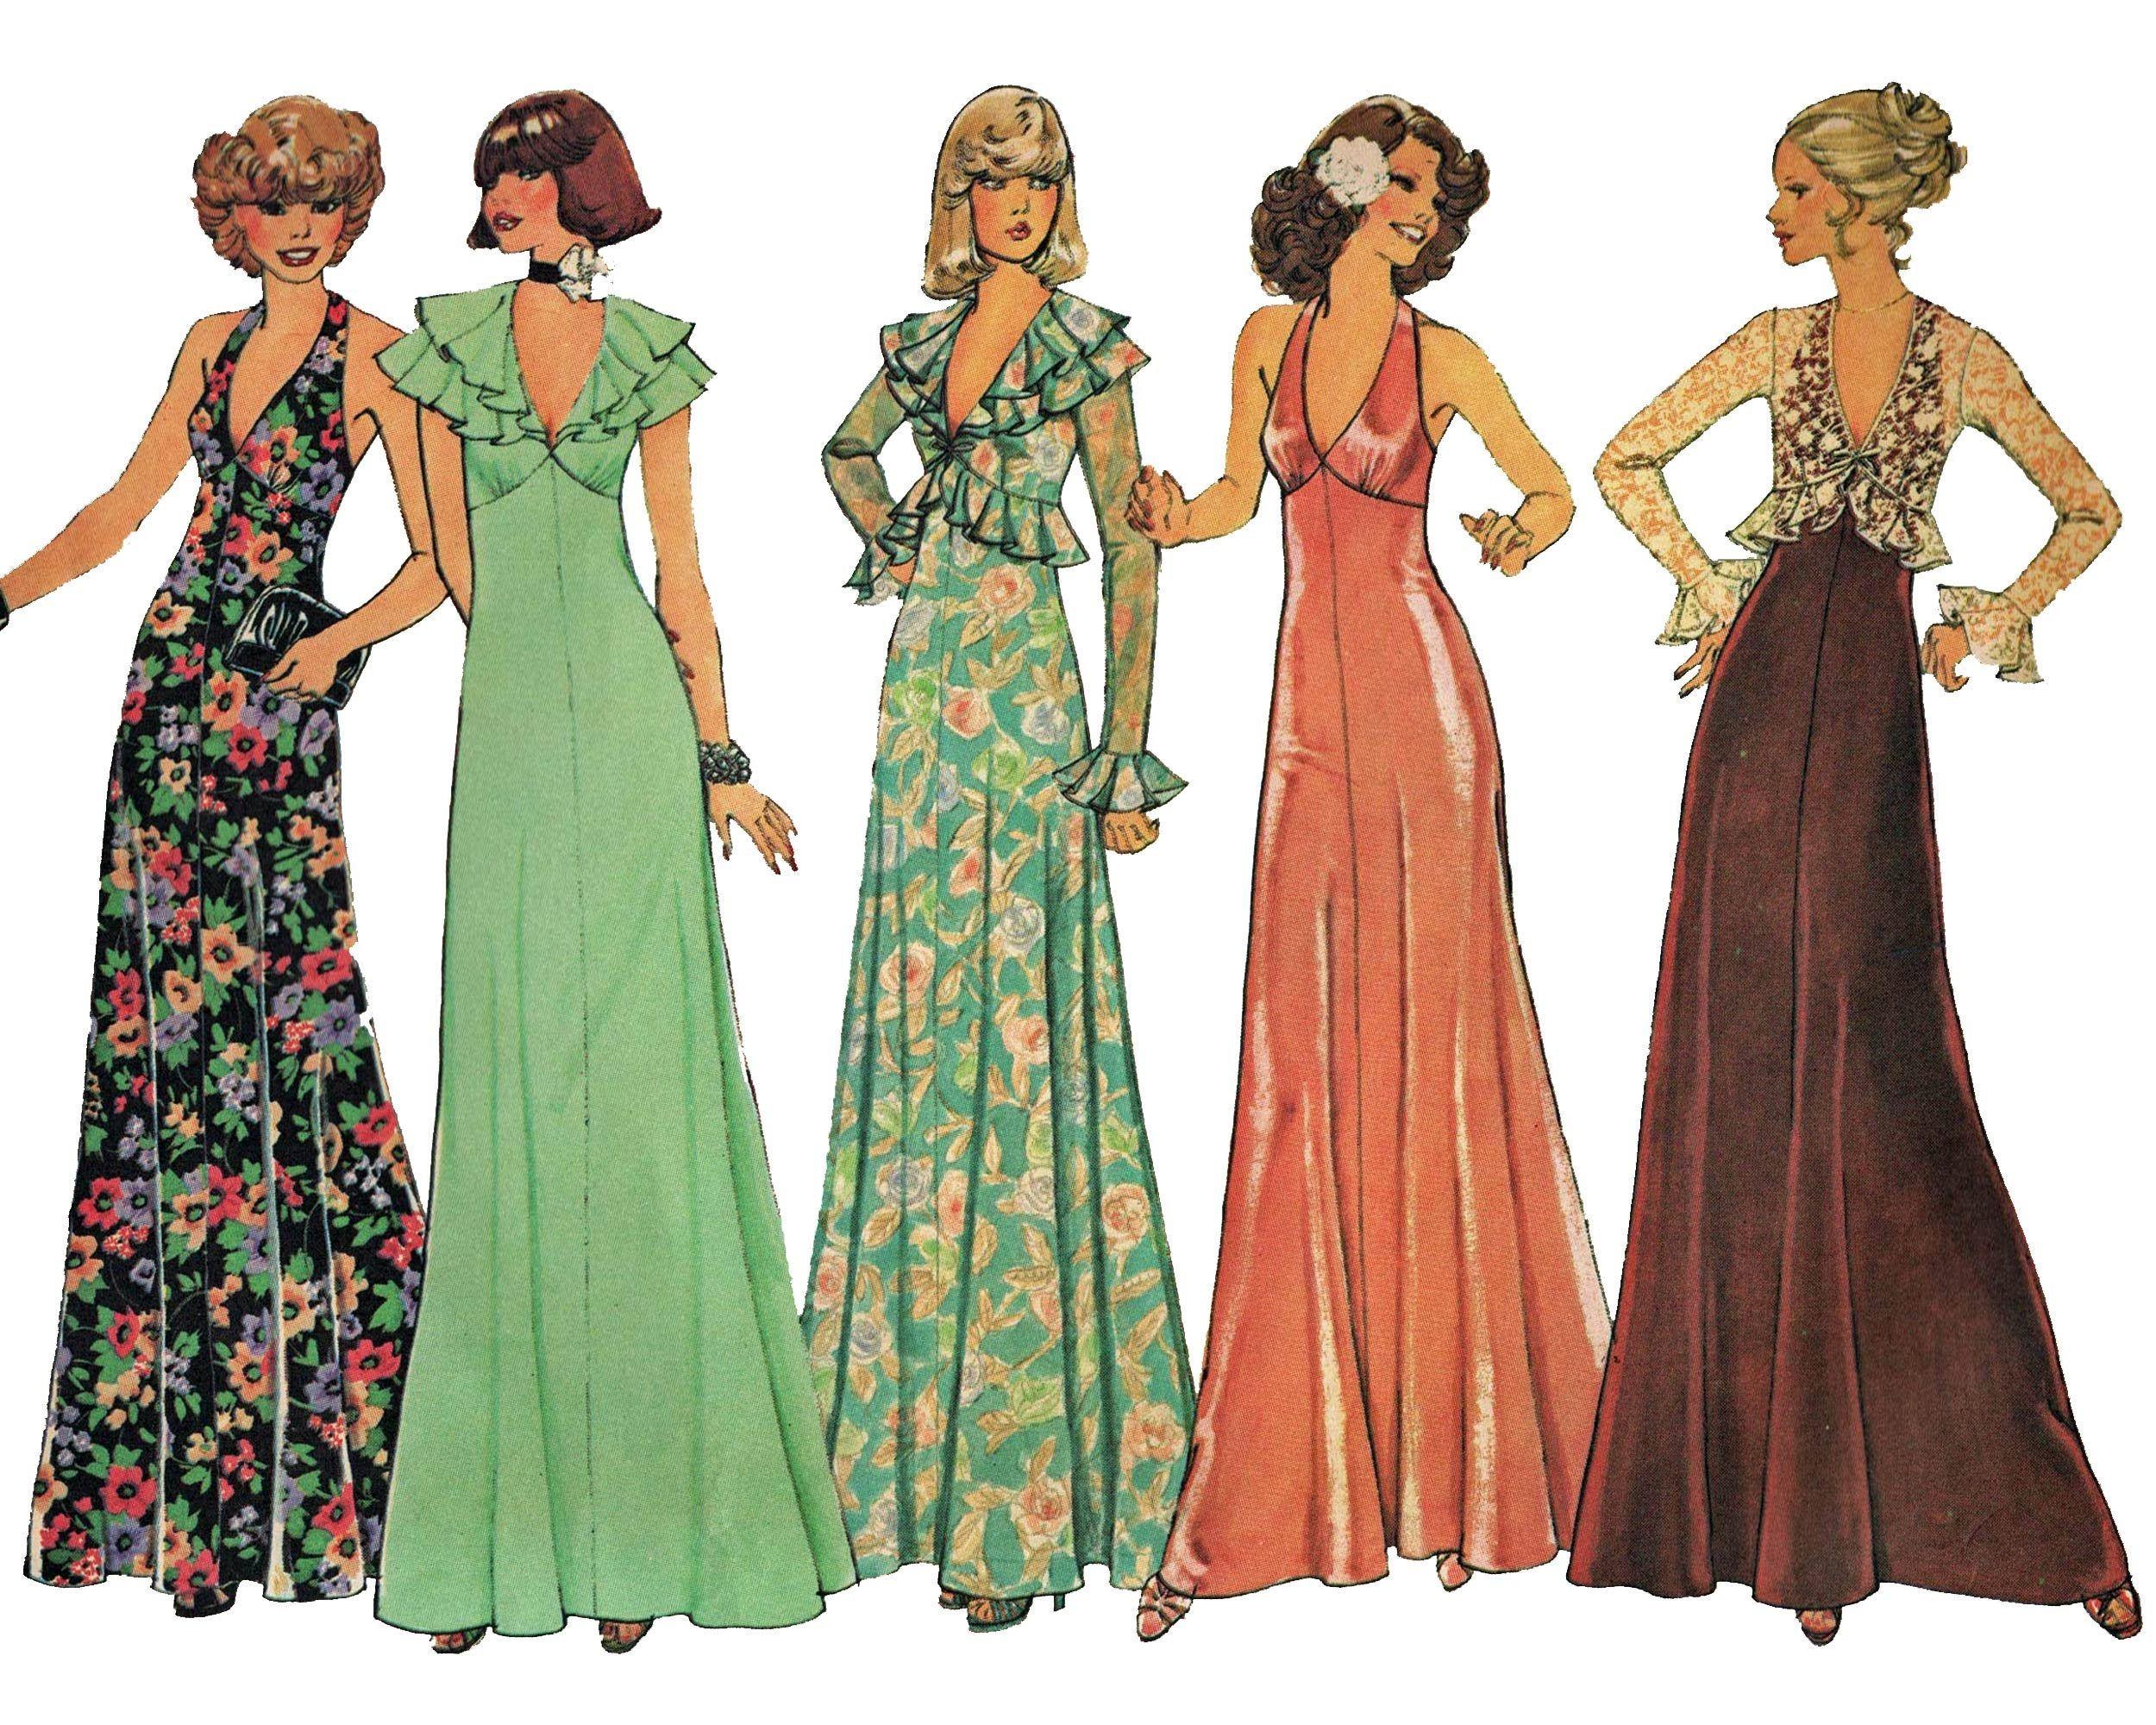 Maxi Halter Dress Pattern Size 8 Vintage 1970s Disco Dress Etsy Gown Sewing Pattern Halter Dress Pattern Vintage Dress Sewing Patterns [ 2000 x 2500 Pixel ]